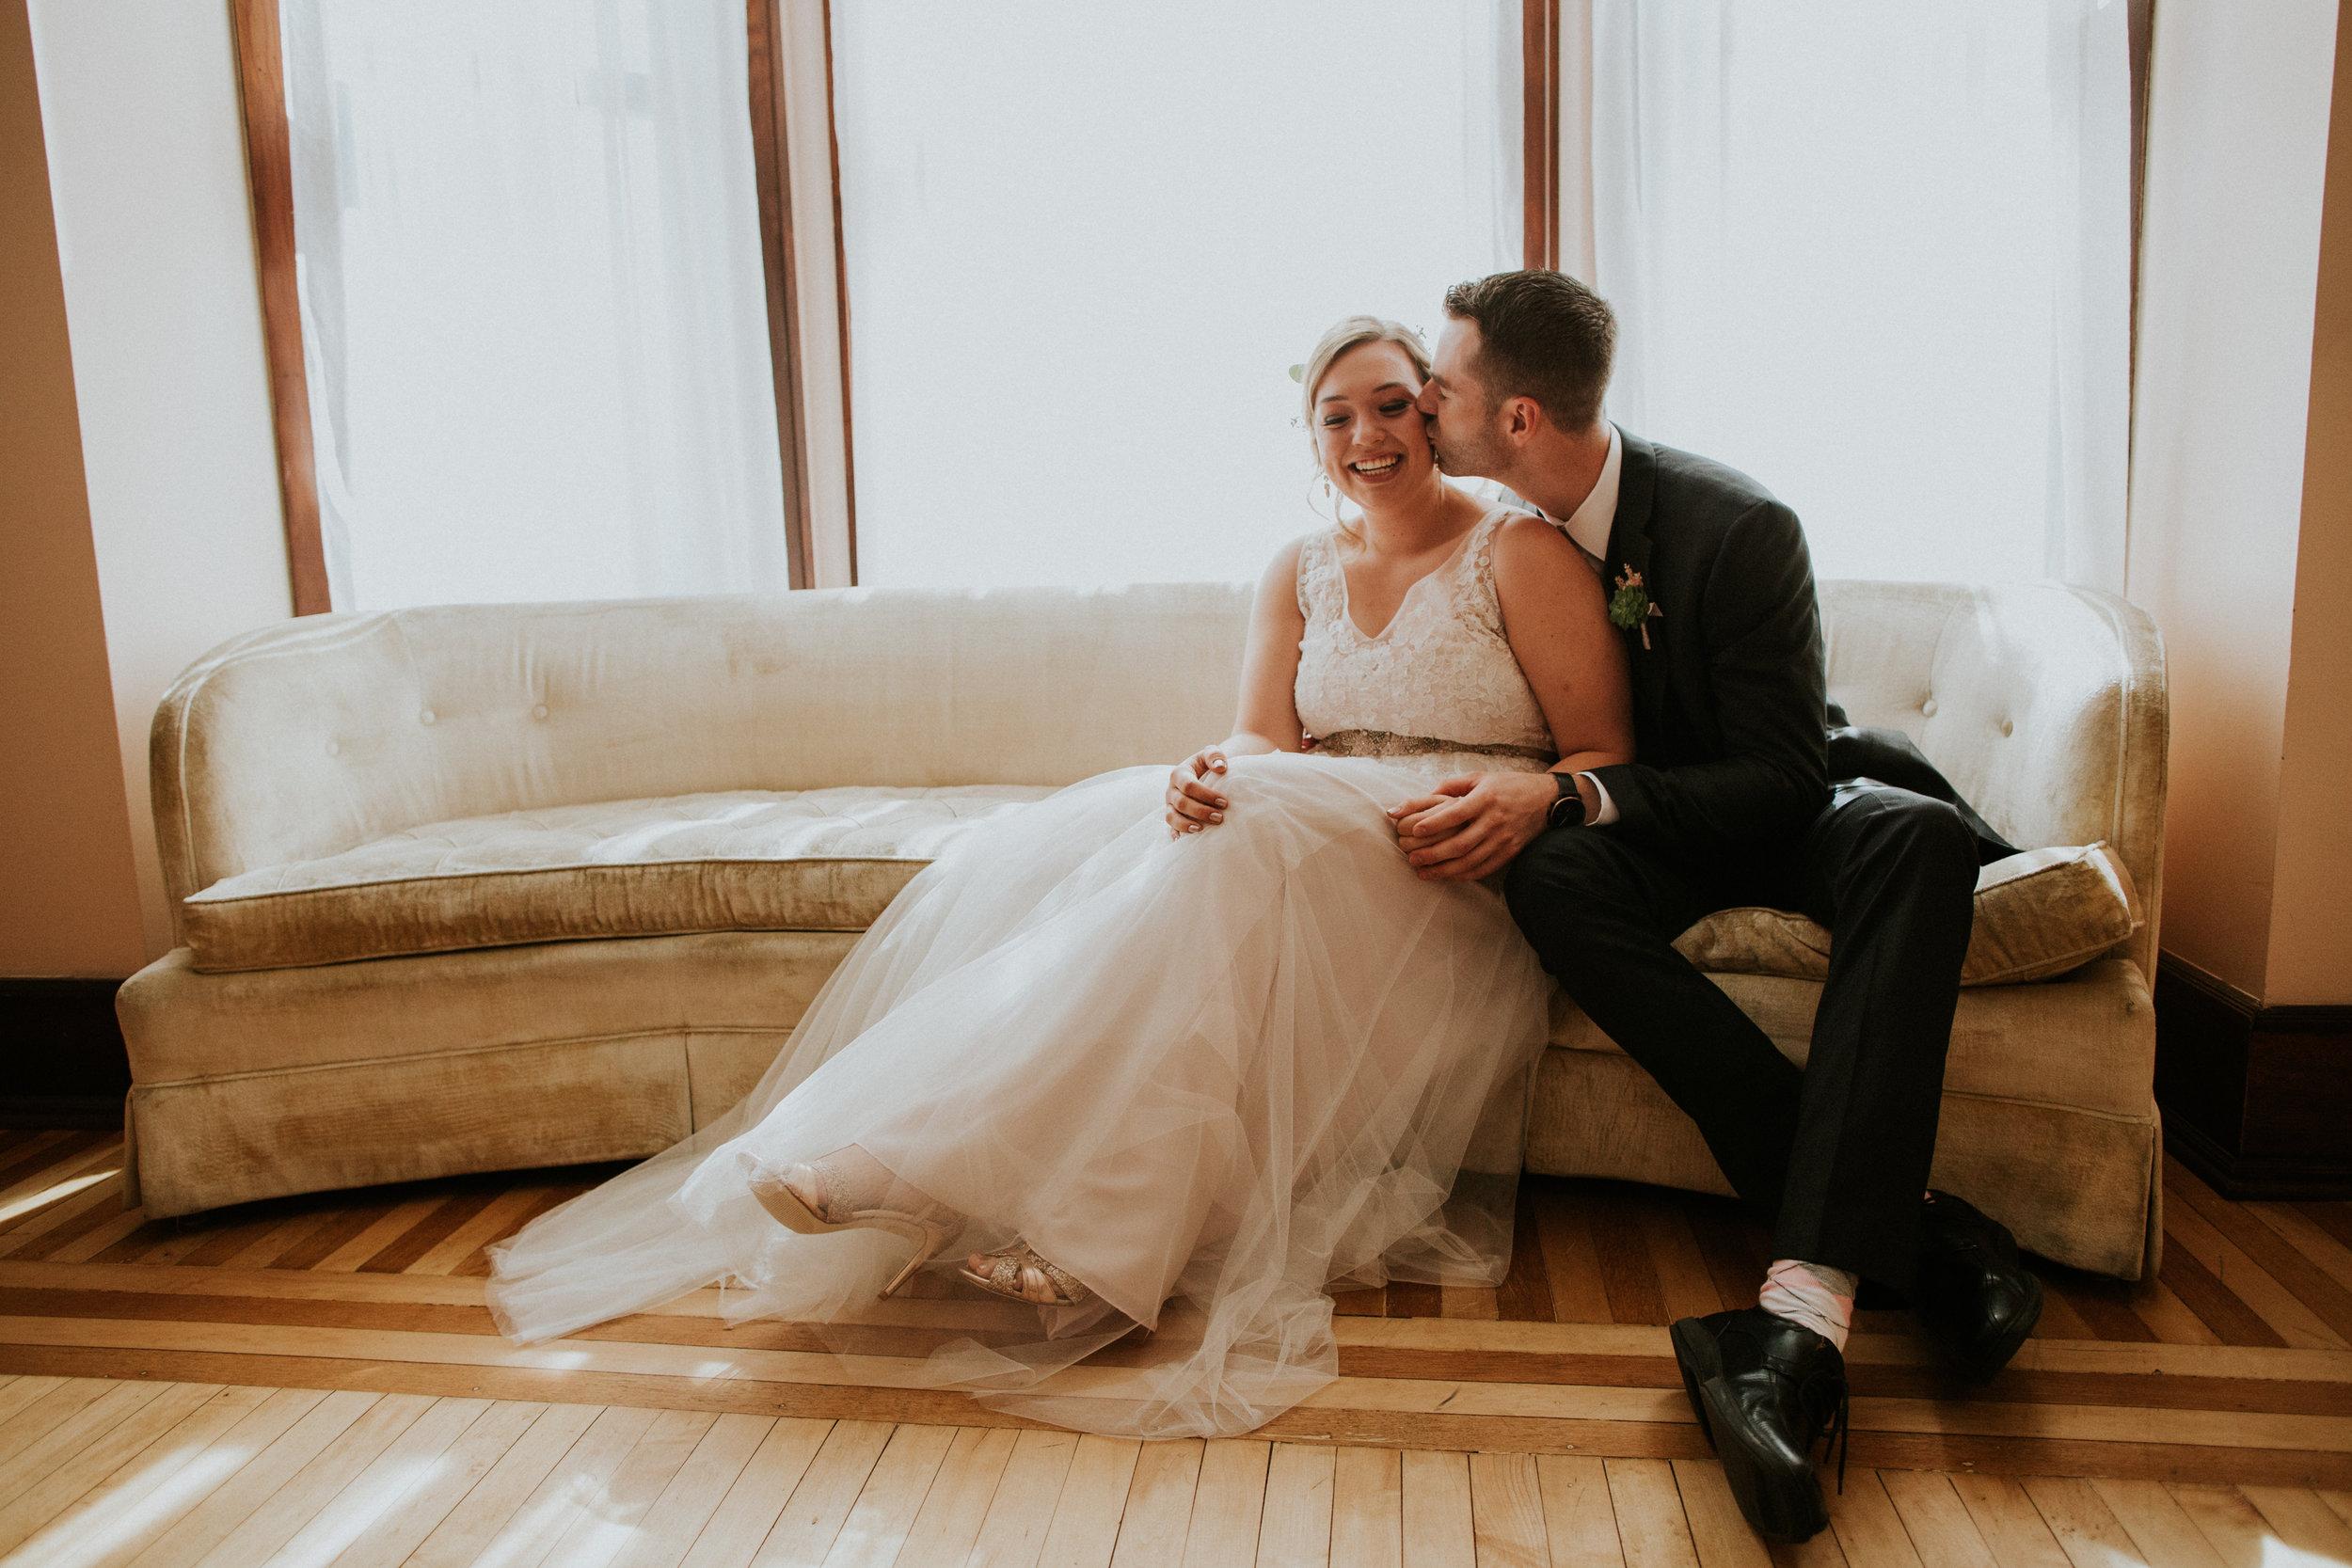 Drew-Laura_Wedding-Day-259.jpg